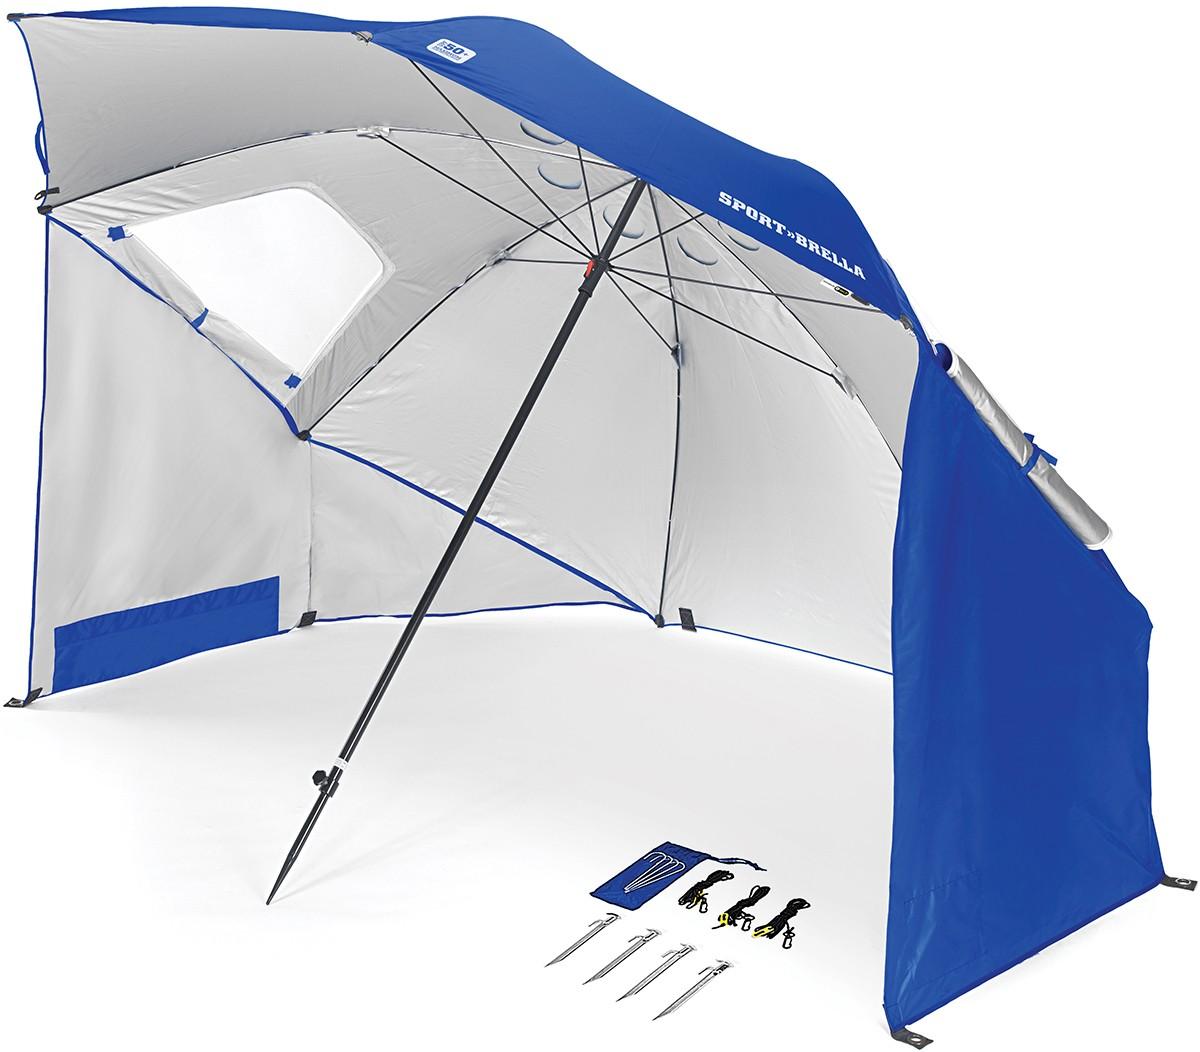 9413cfebfcb6 SKLZ Sport-Brella 8' Sun & Weather Shelter - A00-015